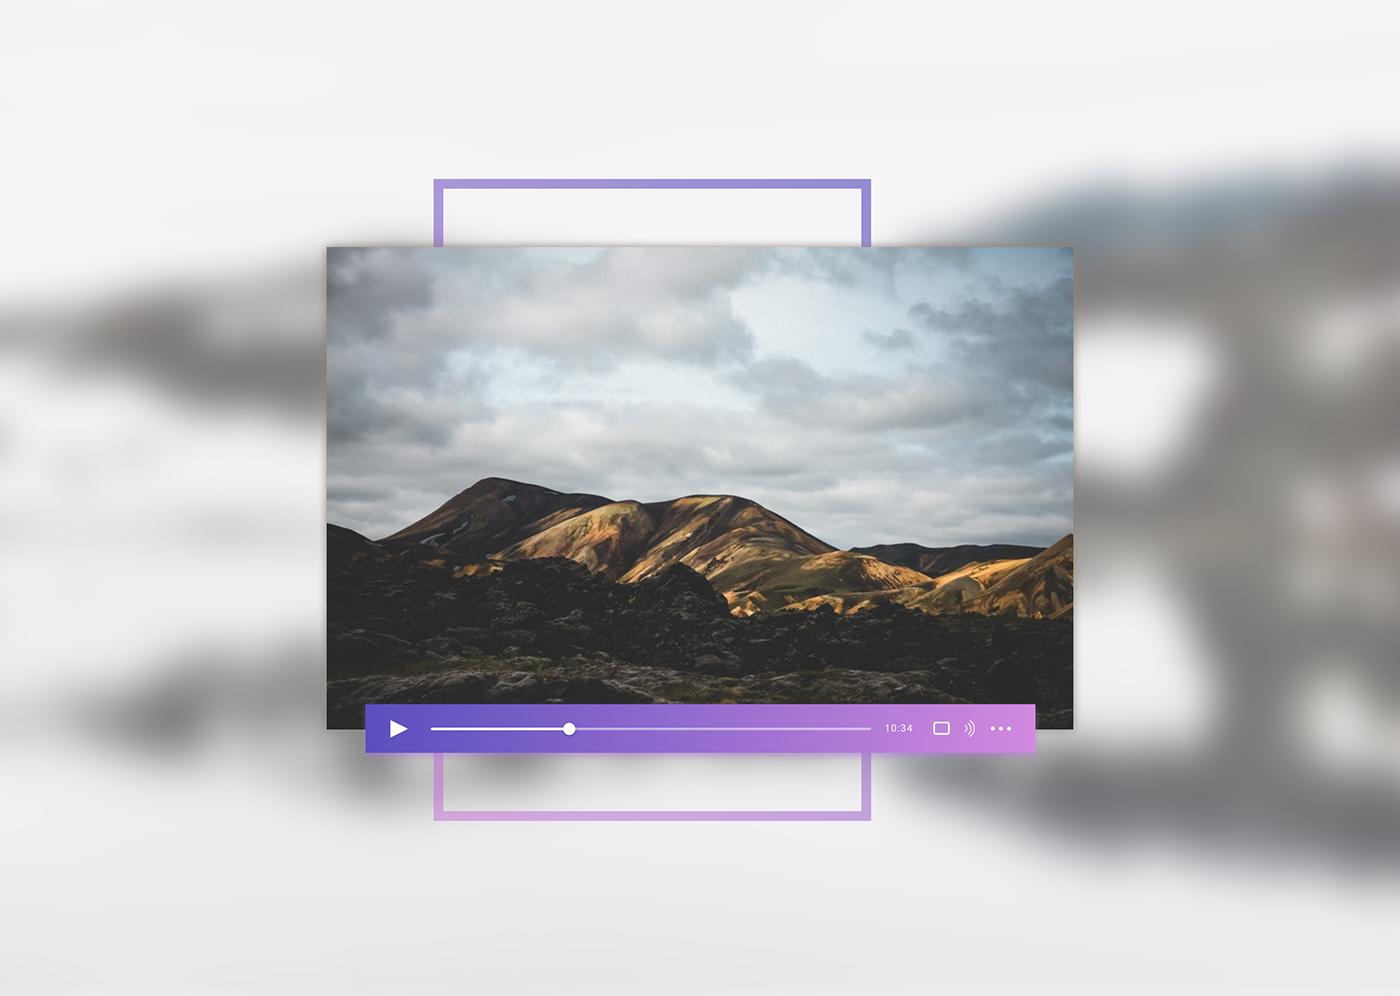 video player video player UI ux Interface design Webdesign user interface interaction